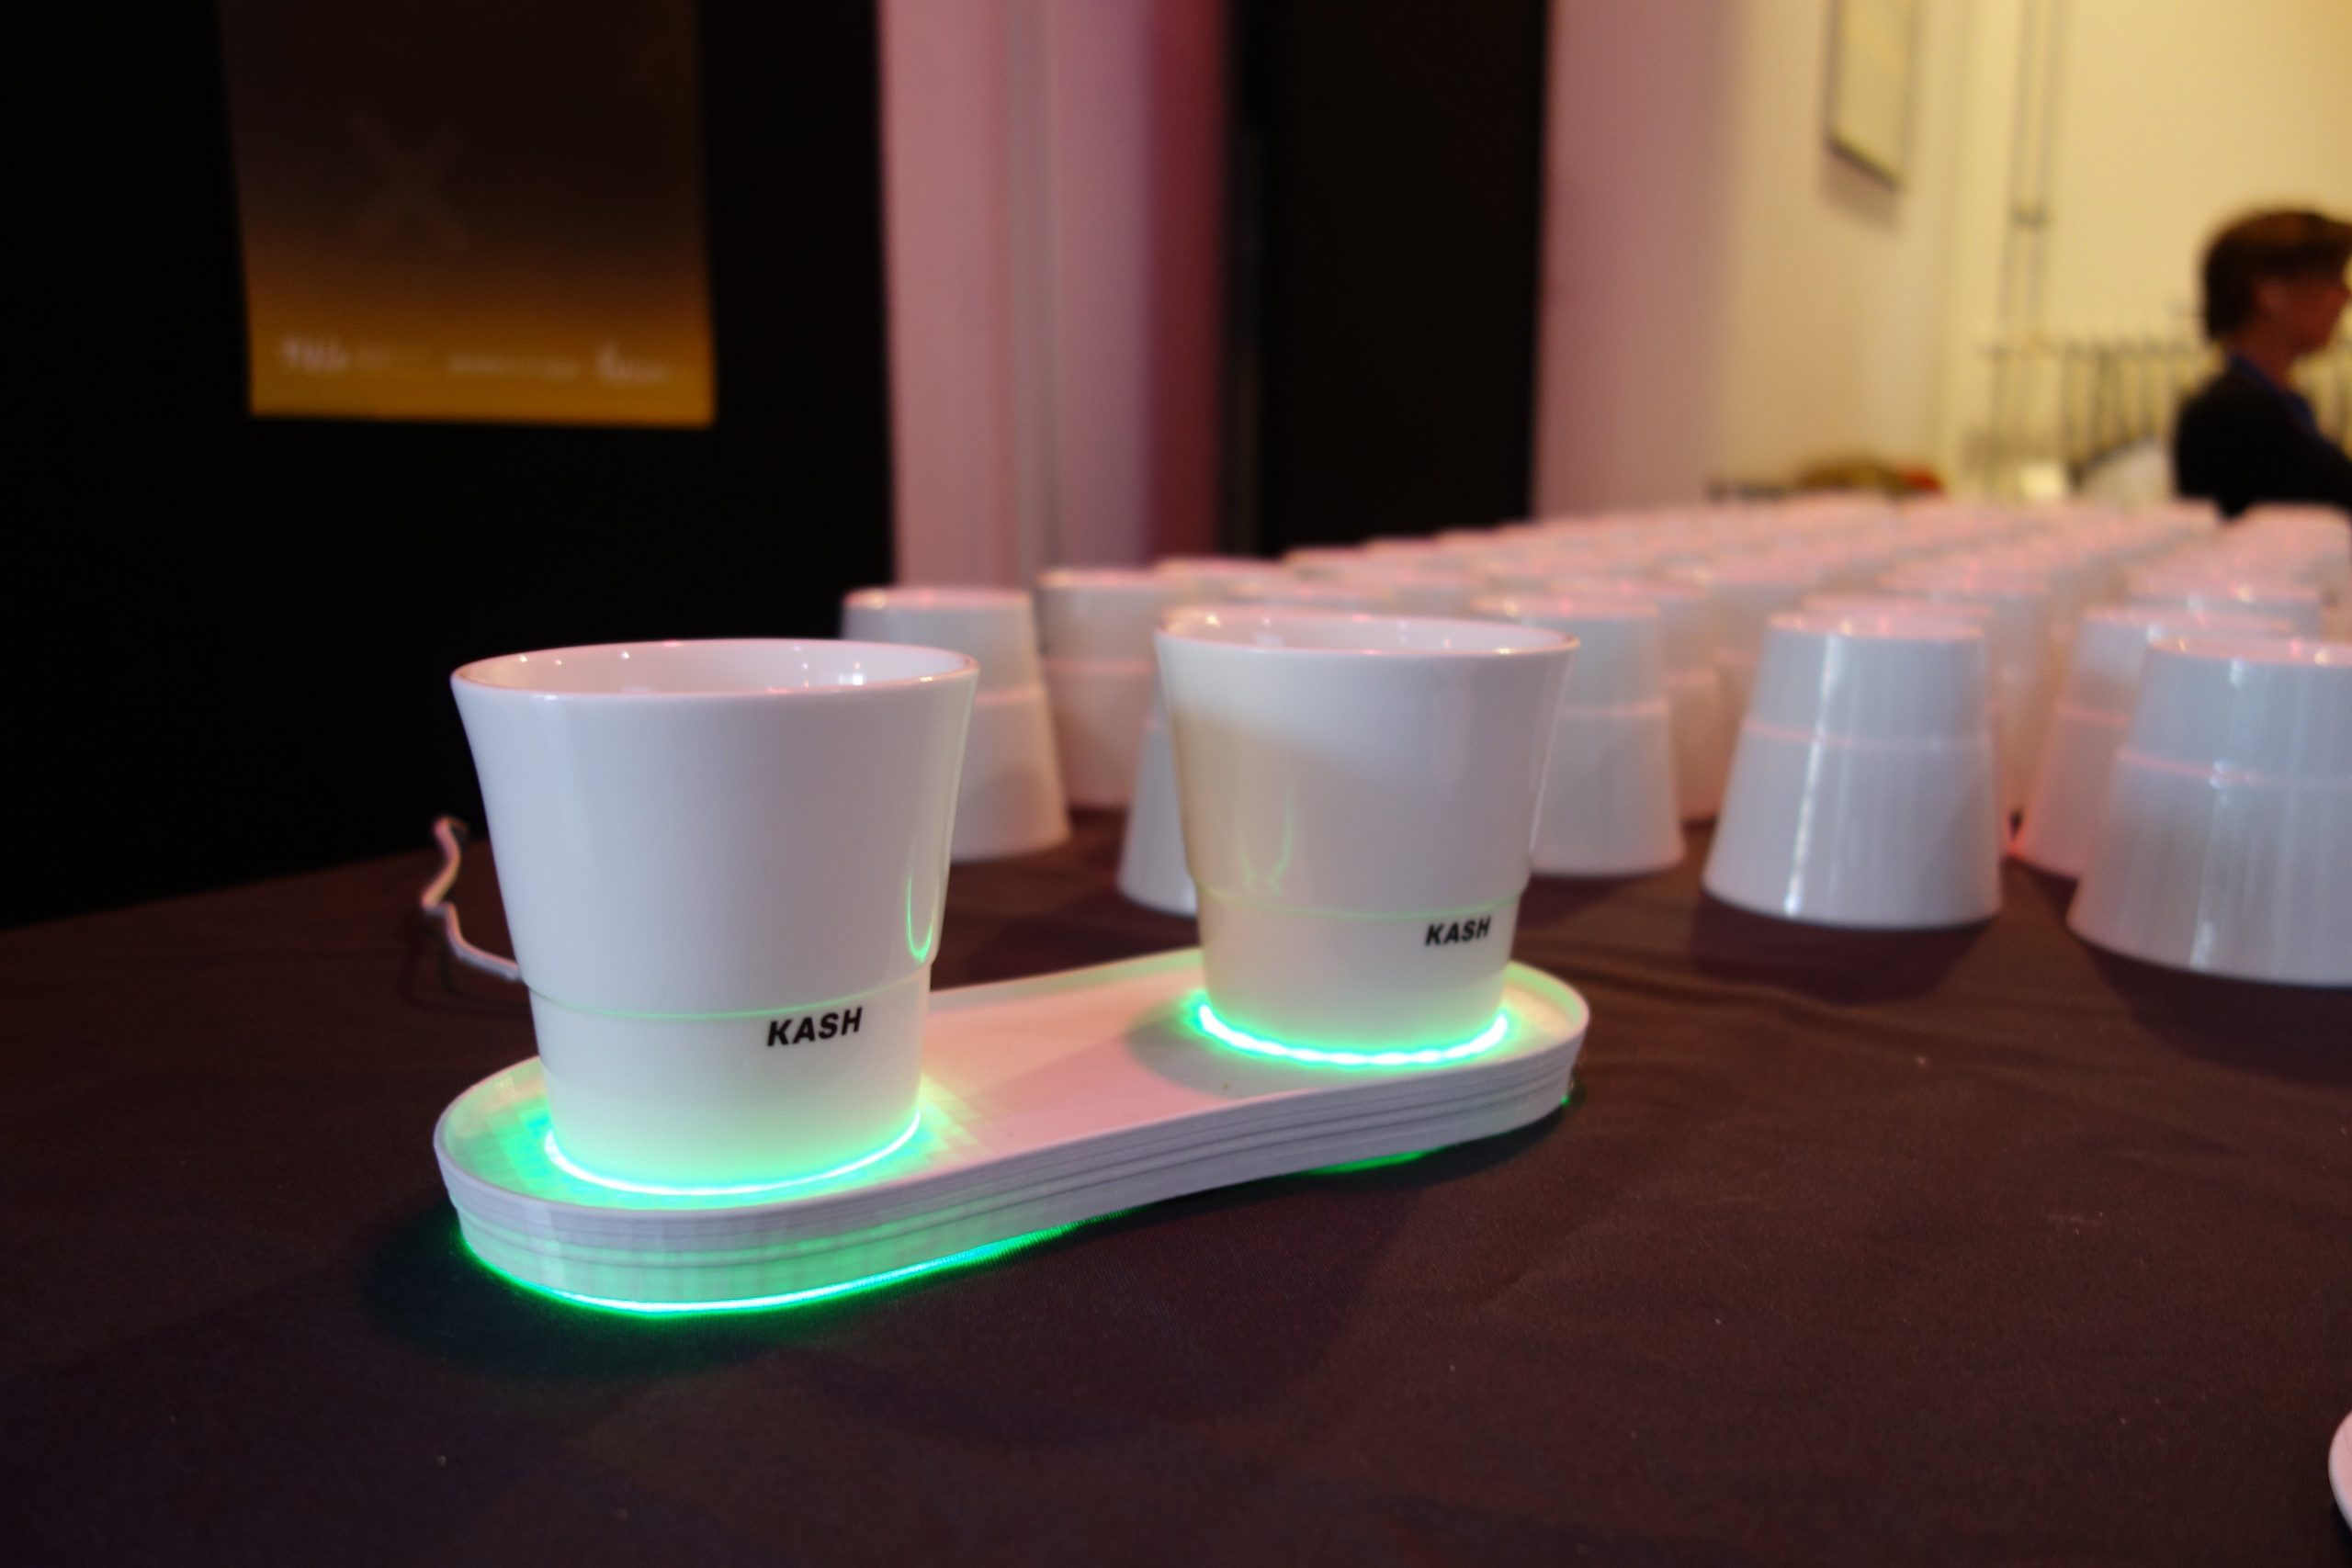 KASH Cups